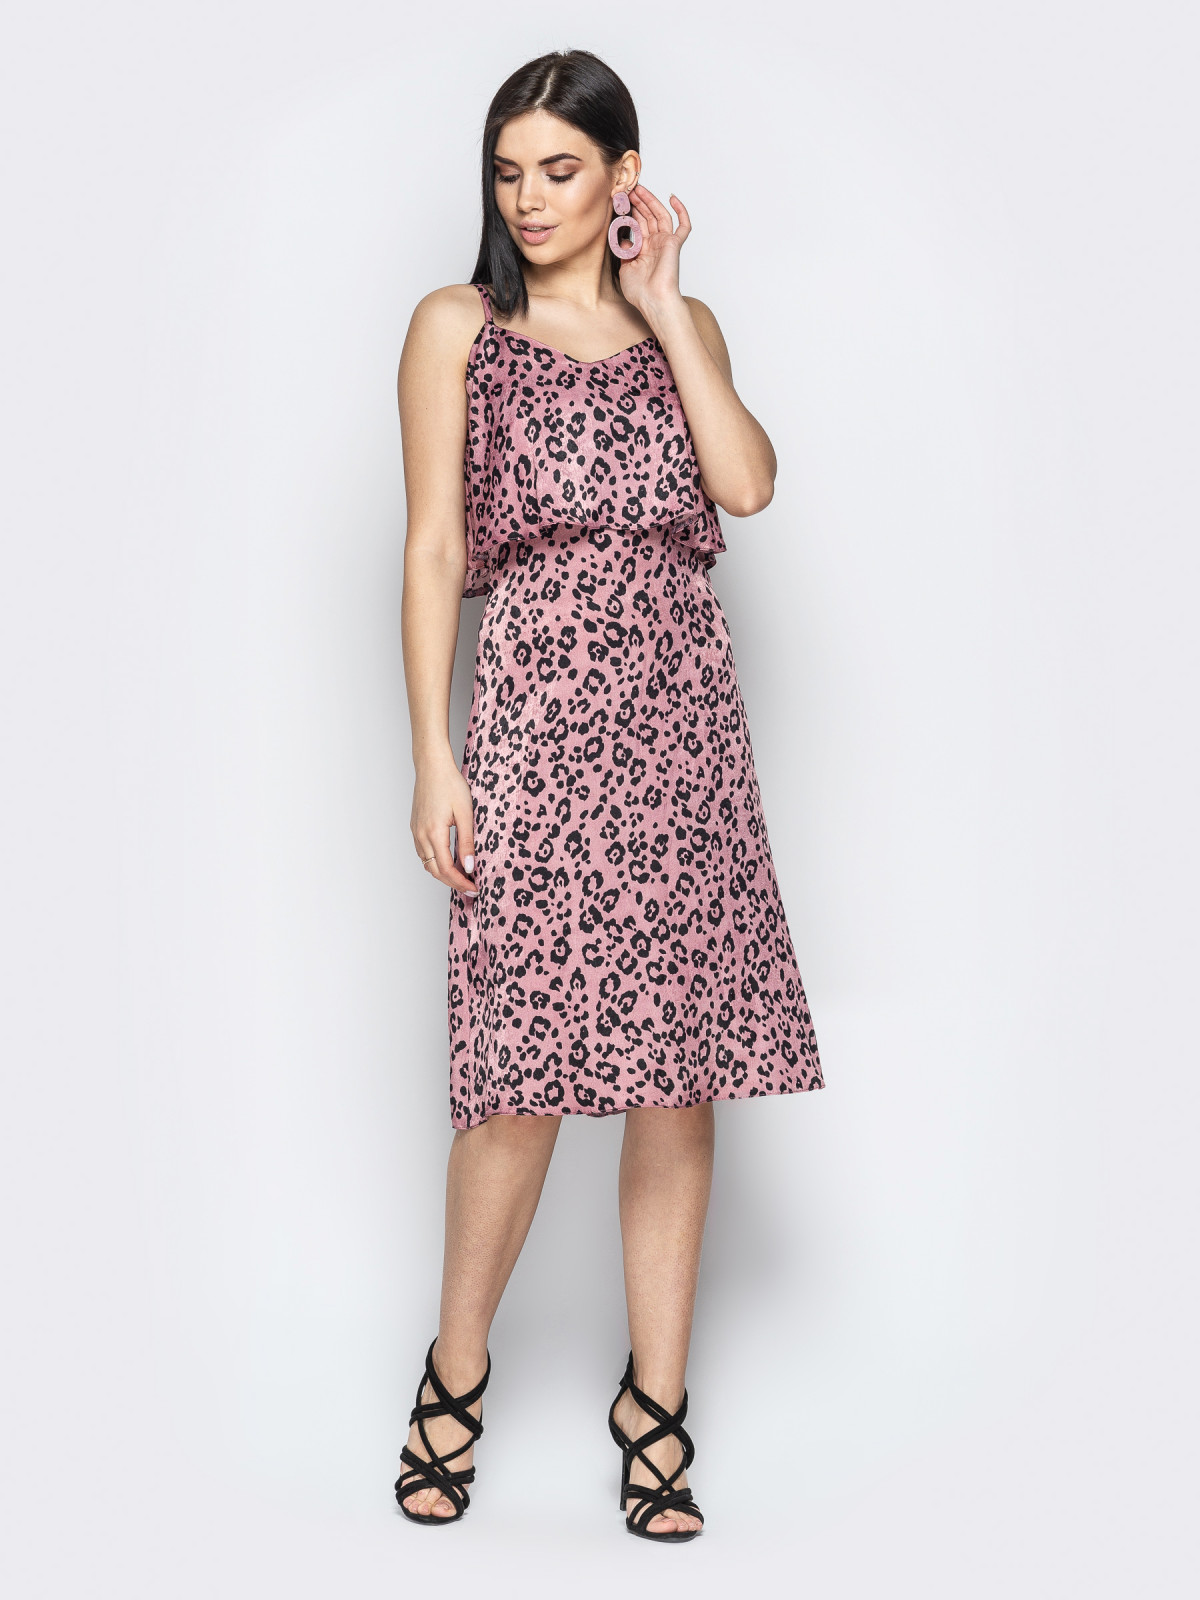 Сарафан Afina леопард розовый